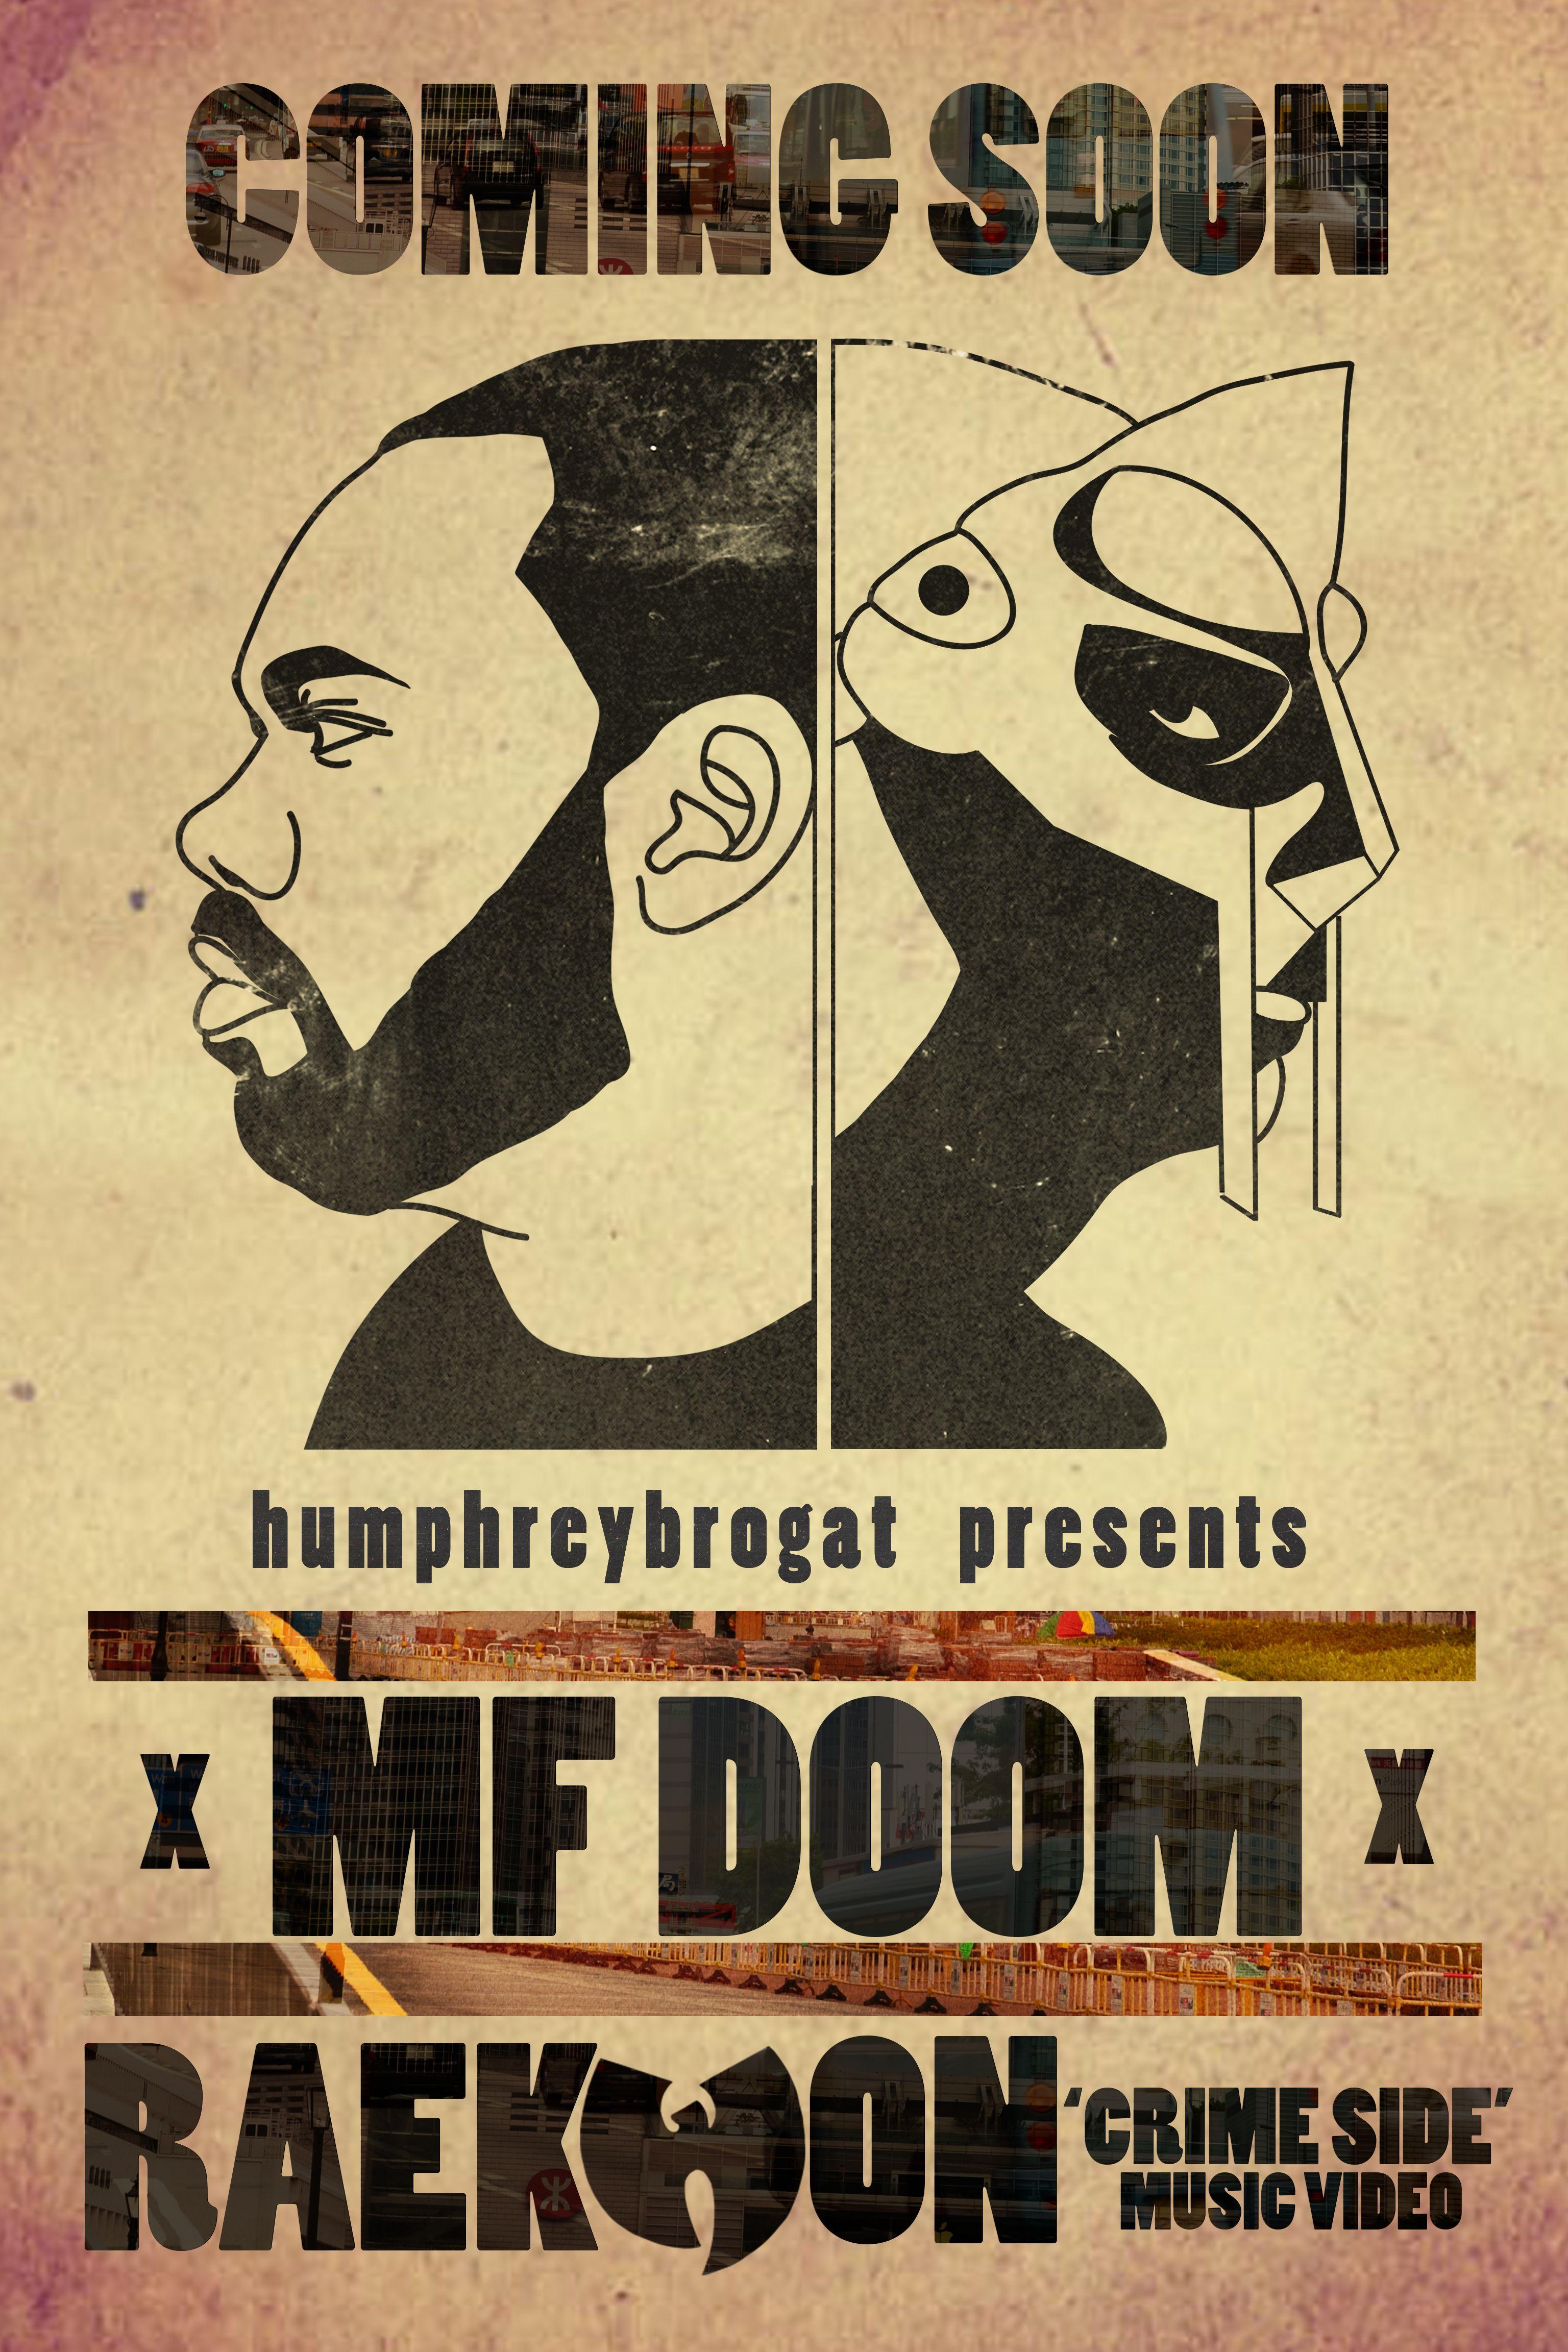 mf doom x raekwon poster by tylerayers